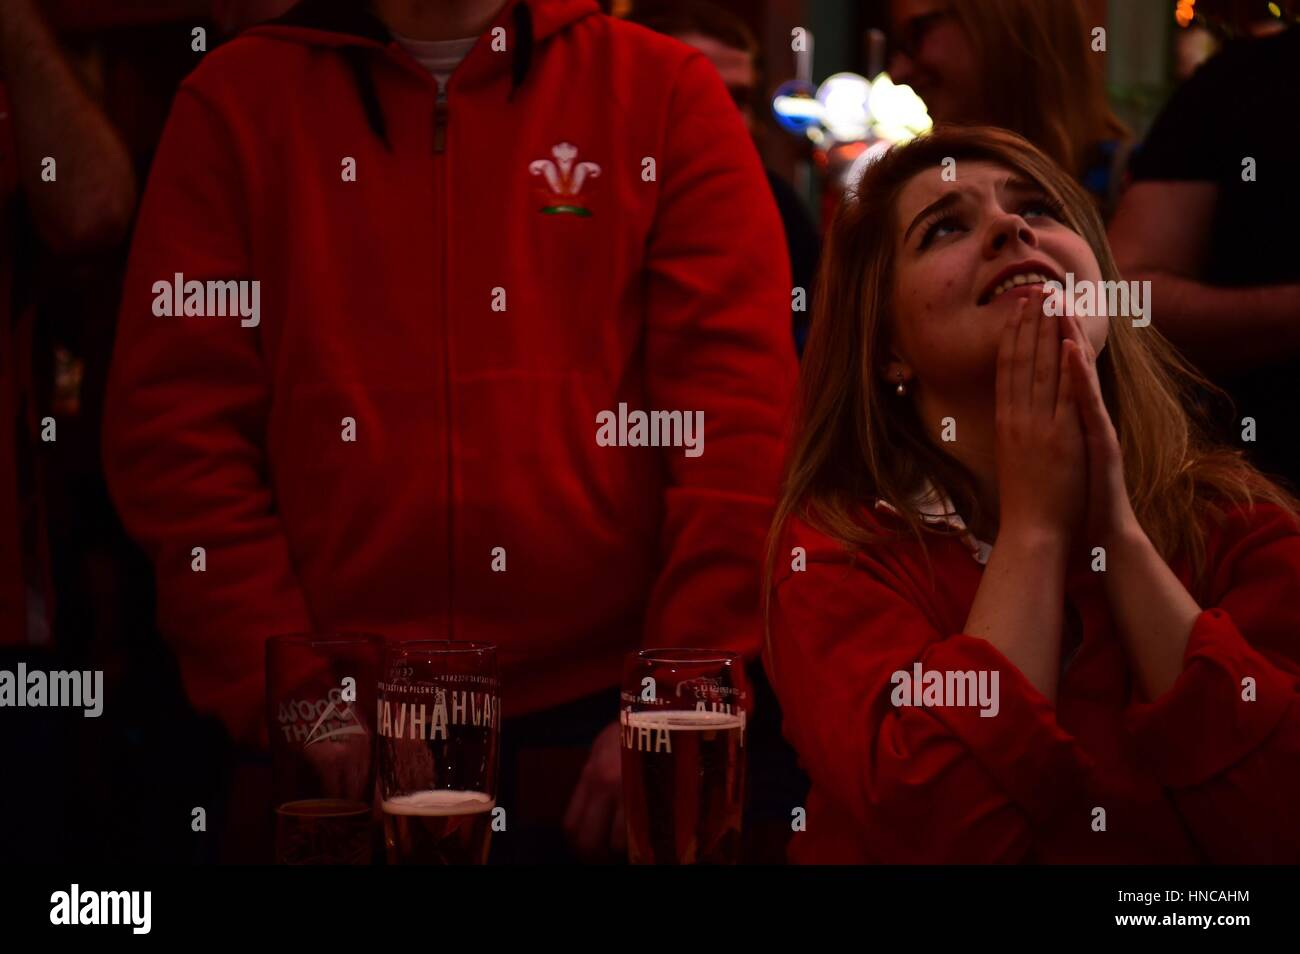 UK Sport: Rugby fans inconsolables Galles regarder jouer contre l'Angleterre dans les Six Nations de rugby Photo Stock